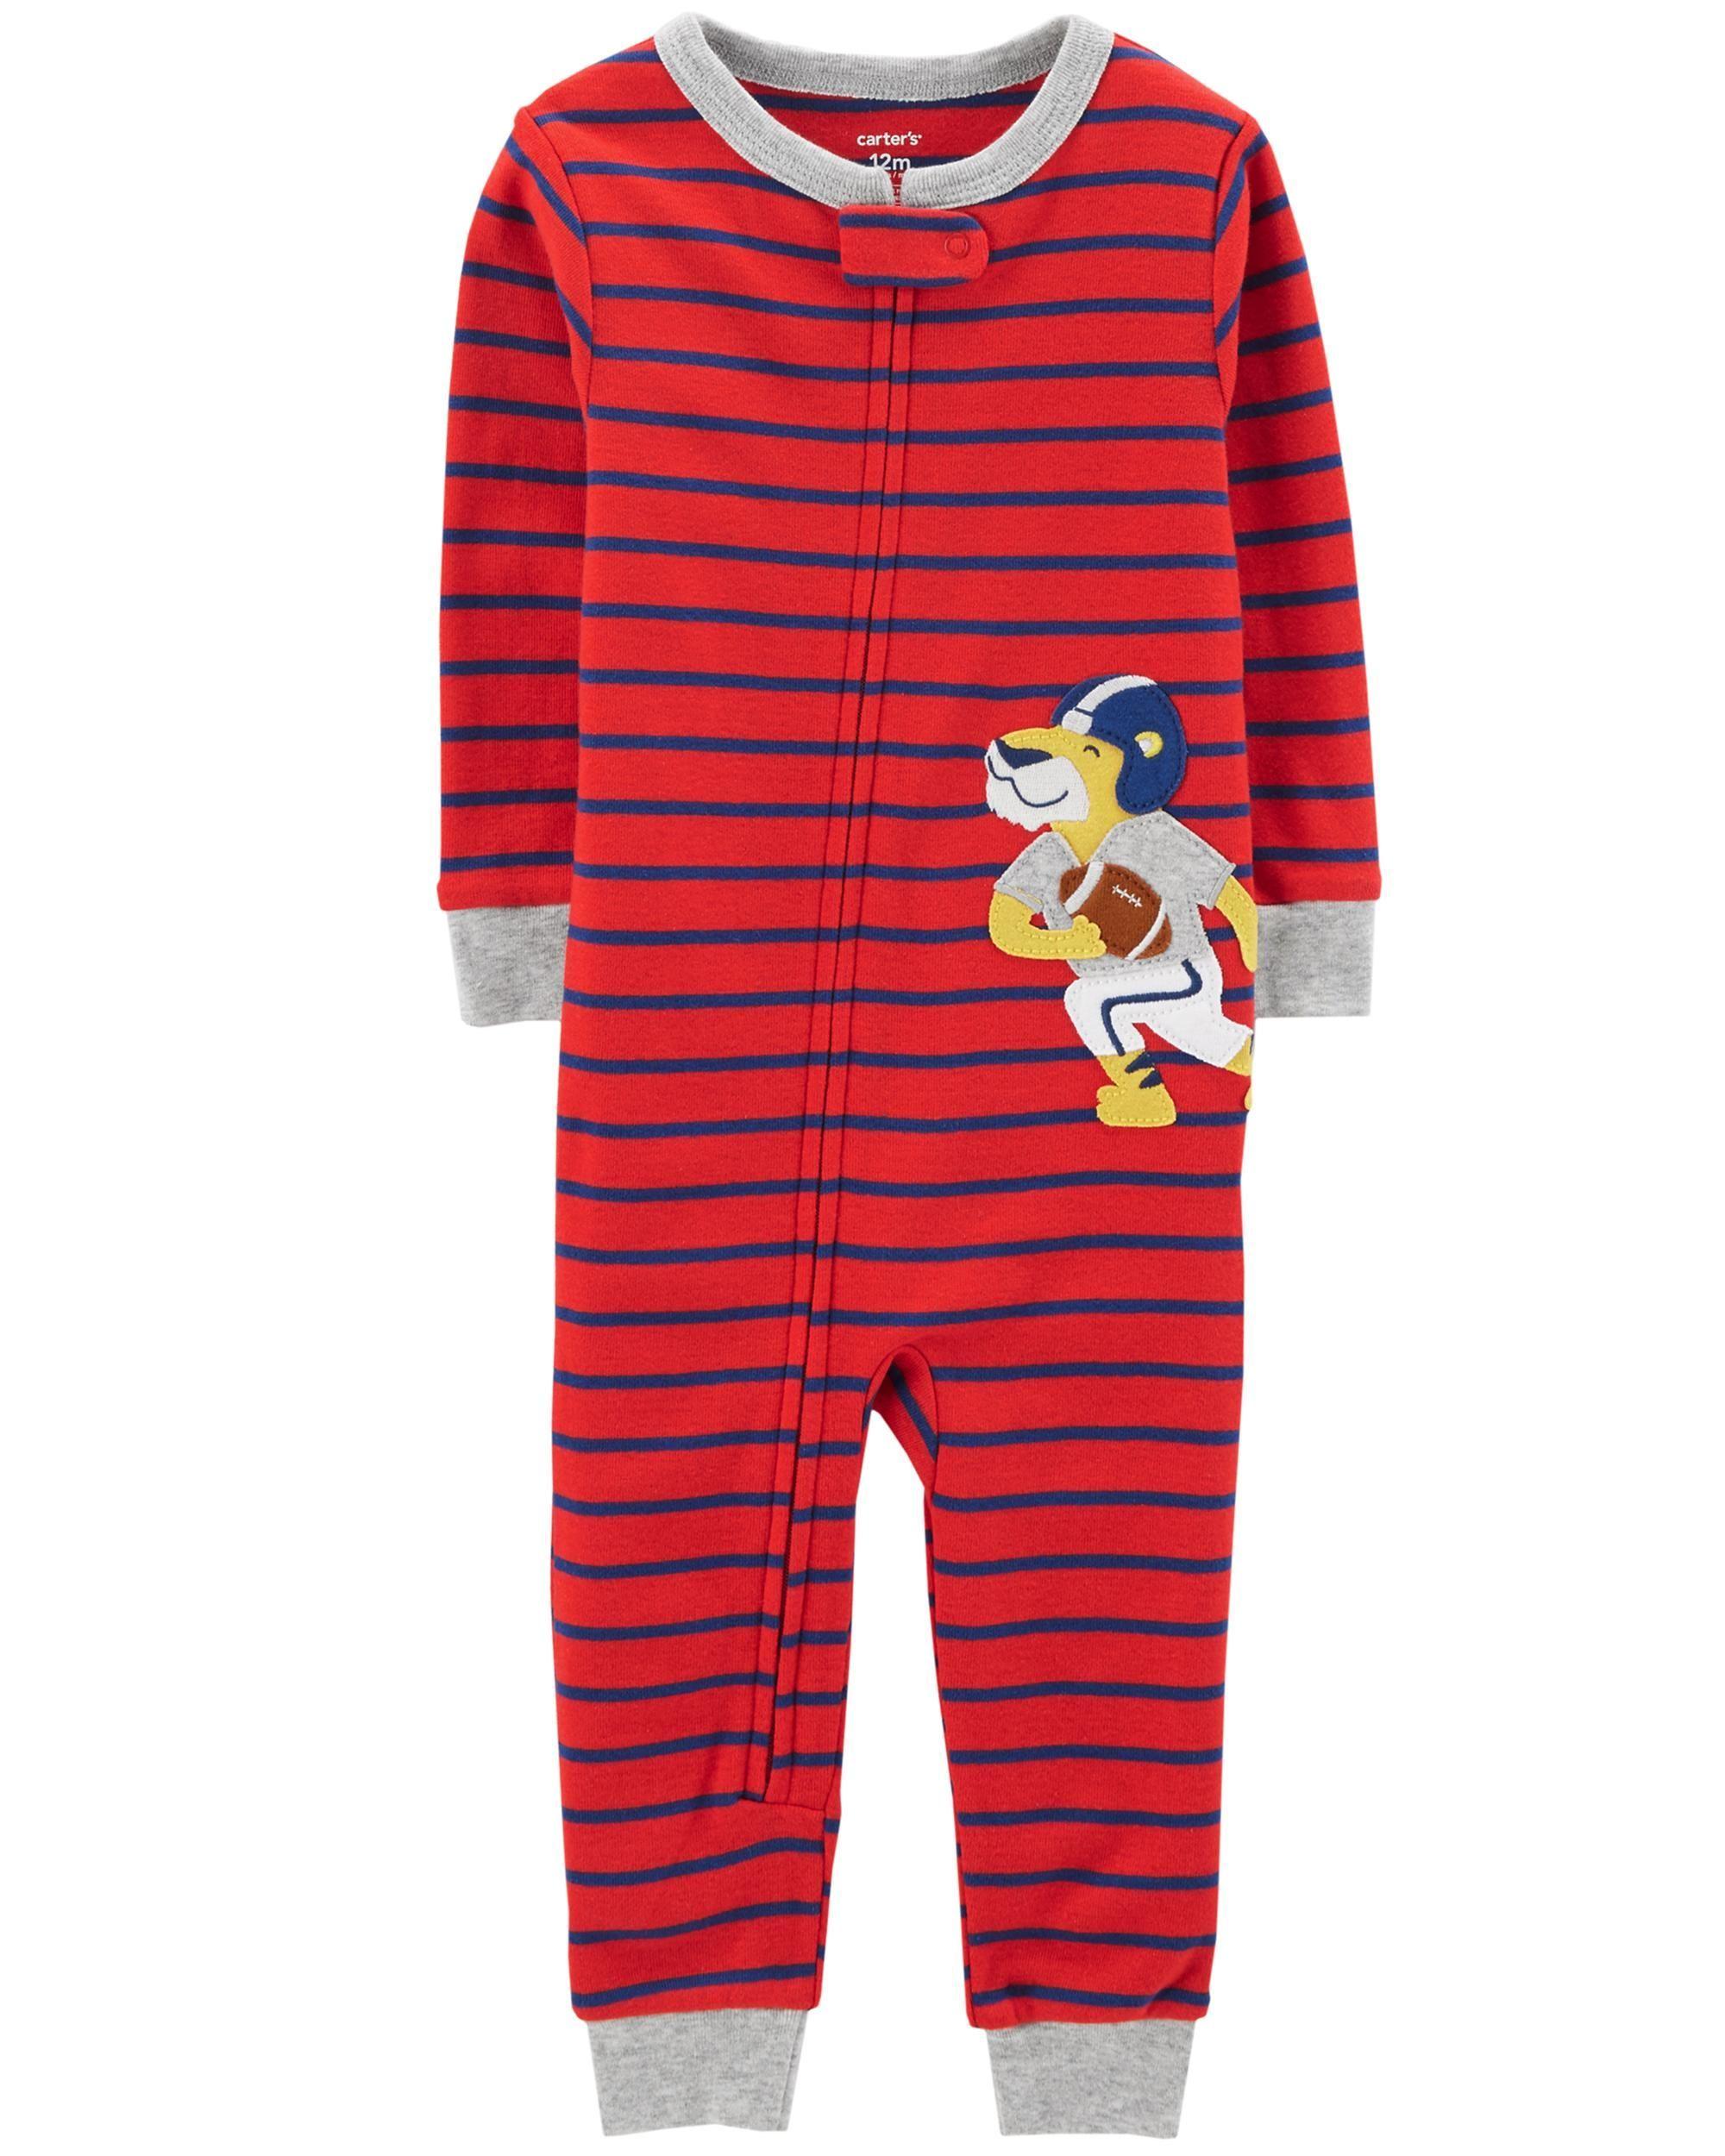 4f08dc352e52 1-Piece Tiger Snug Fit Cotton Footless PJs